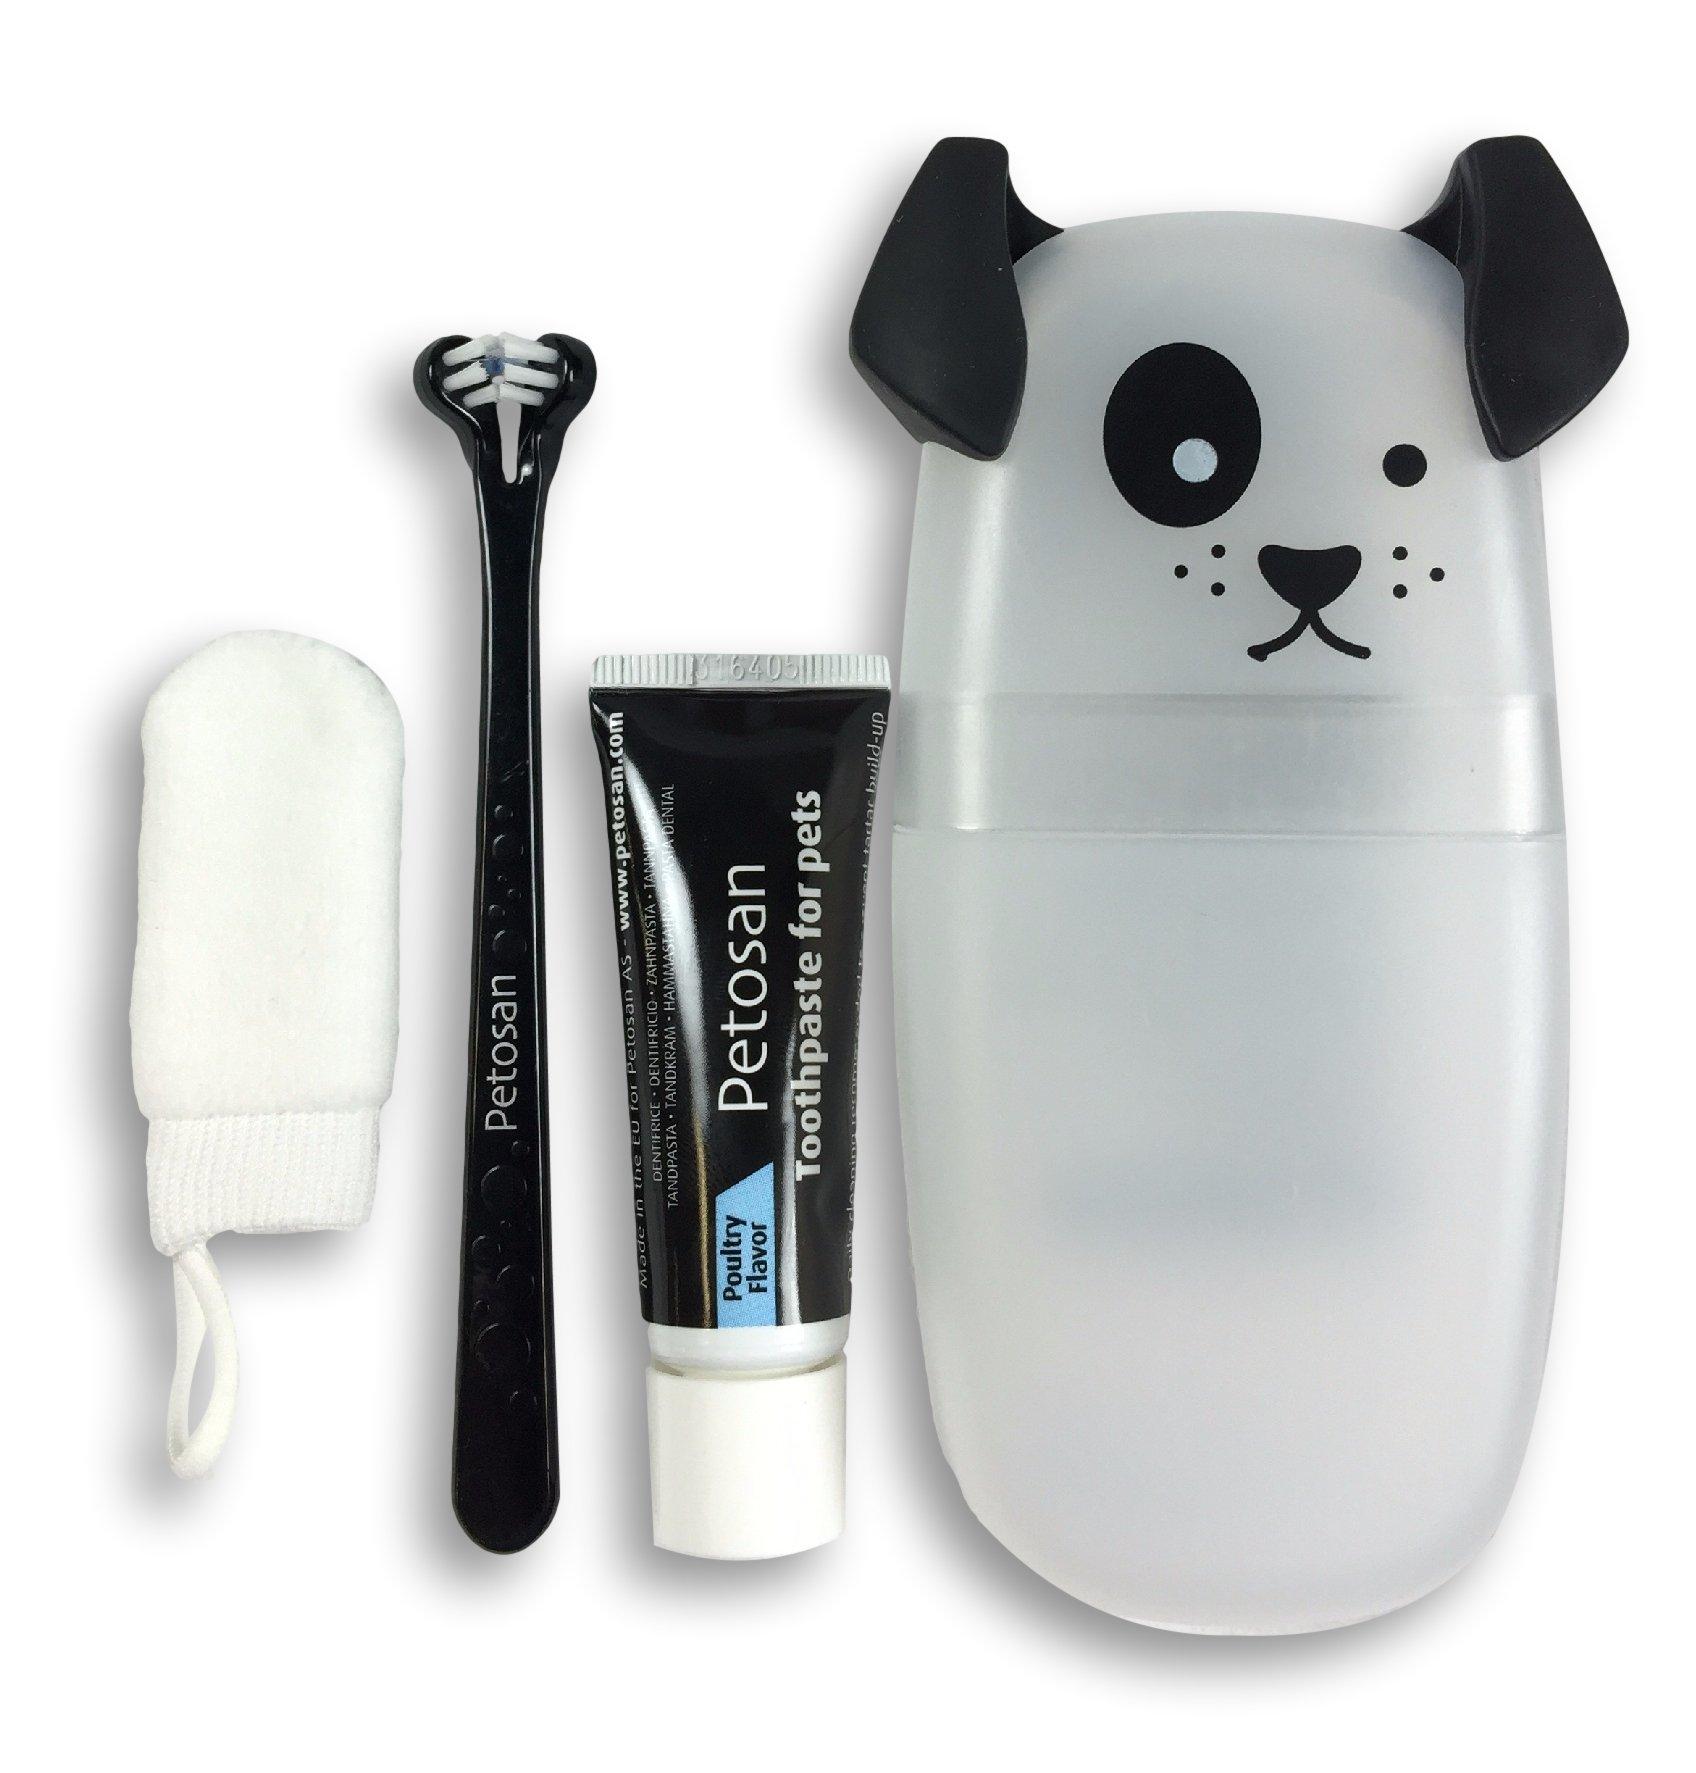 Petosan USA Puppy Dental Kit for Oral Care